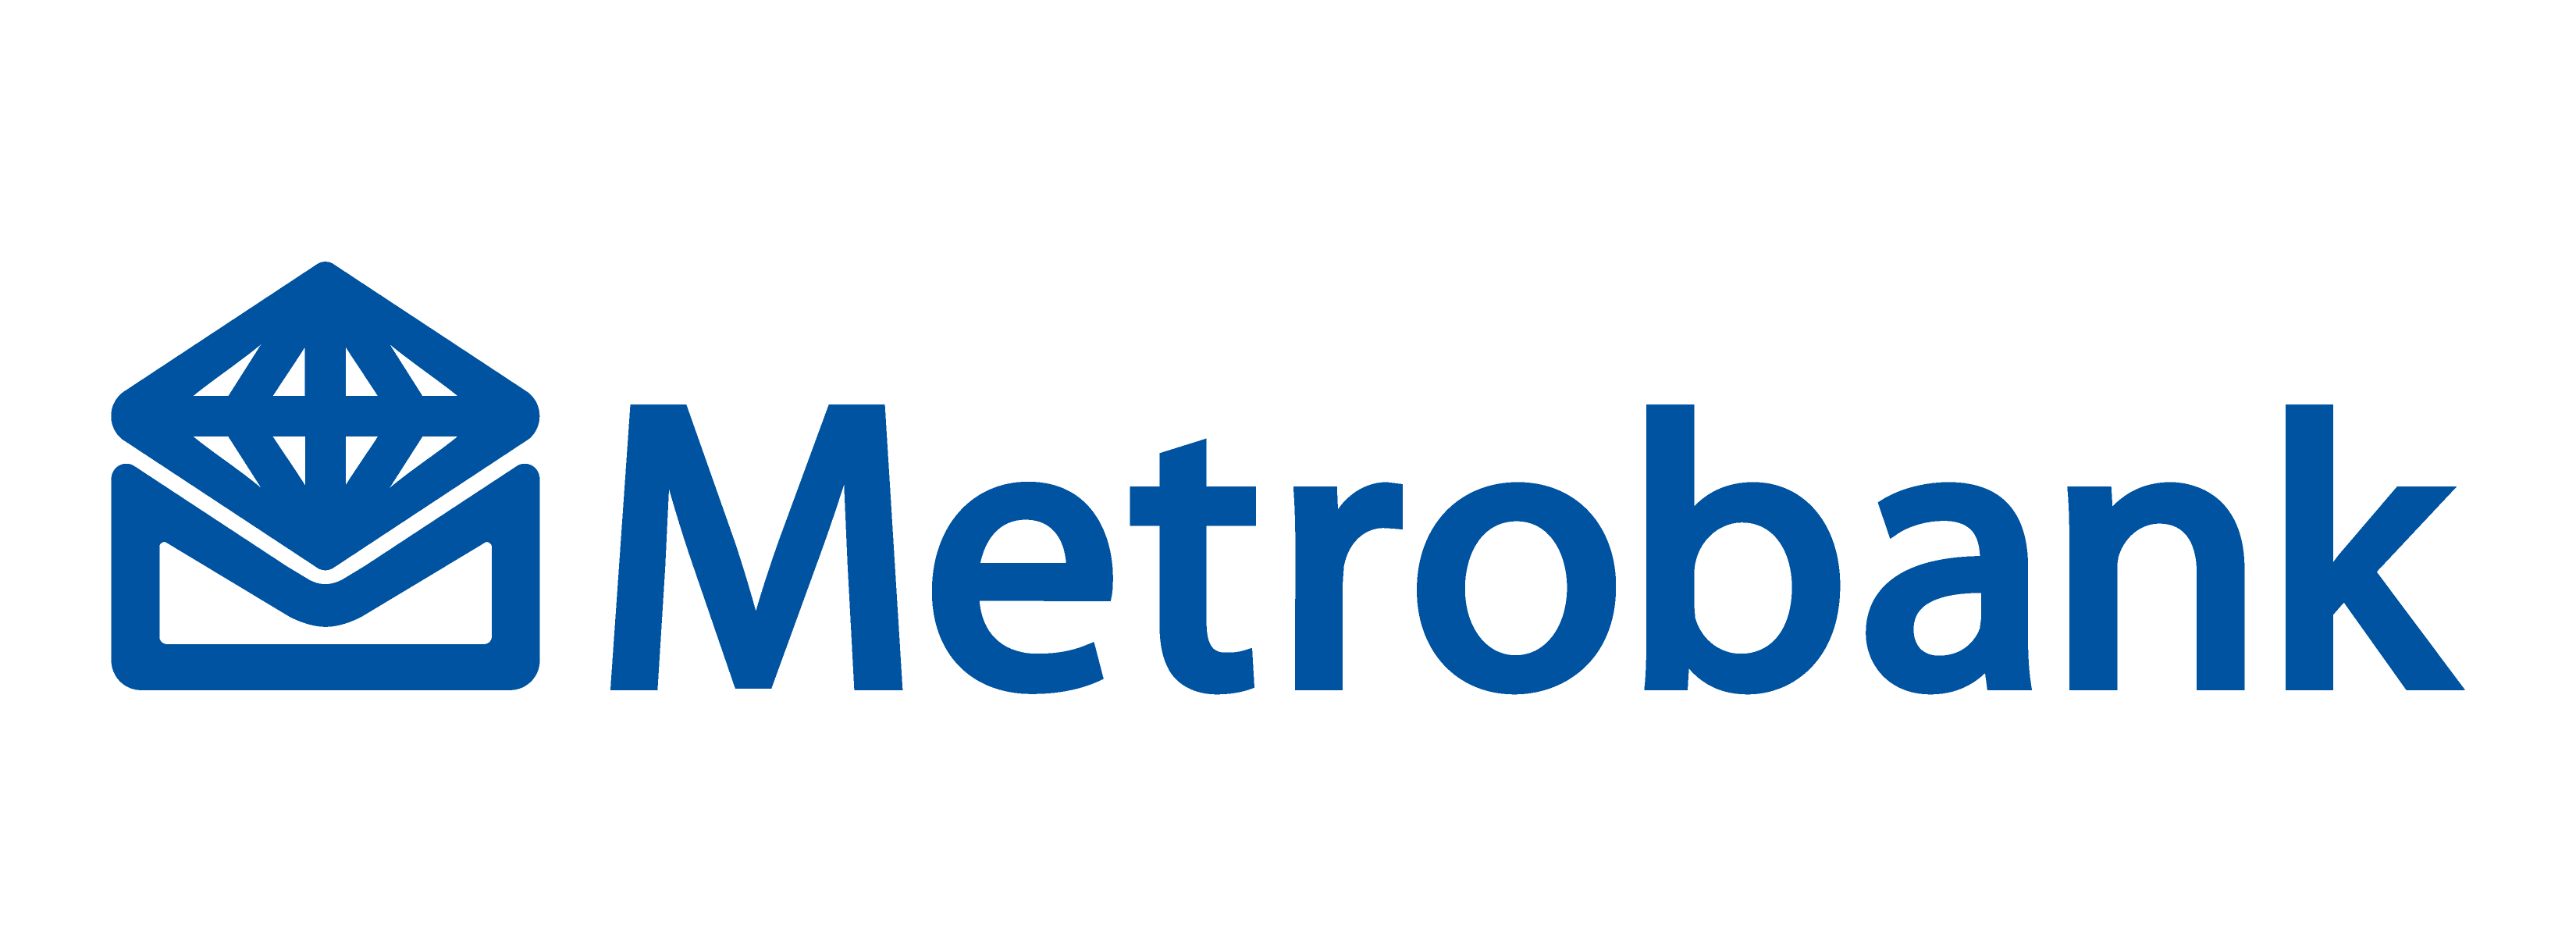 metrobank philippines investments